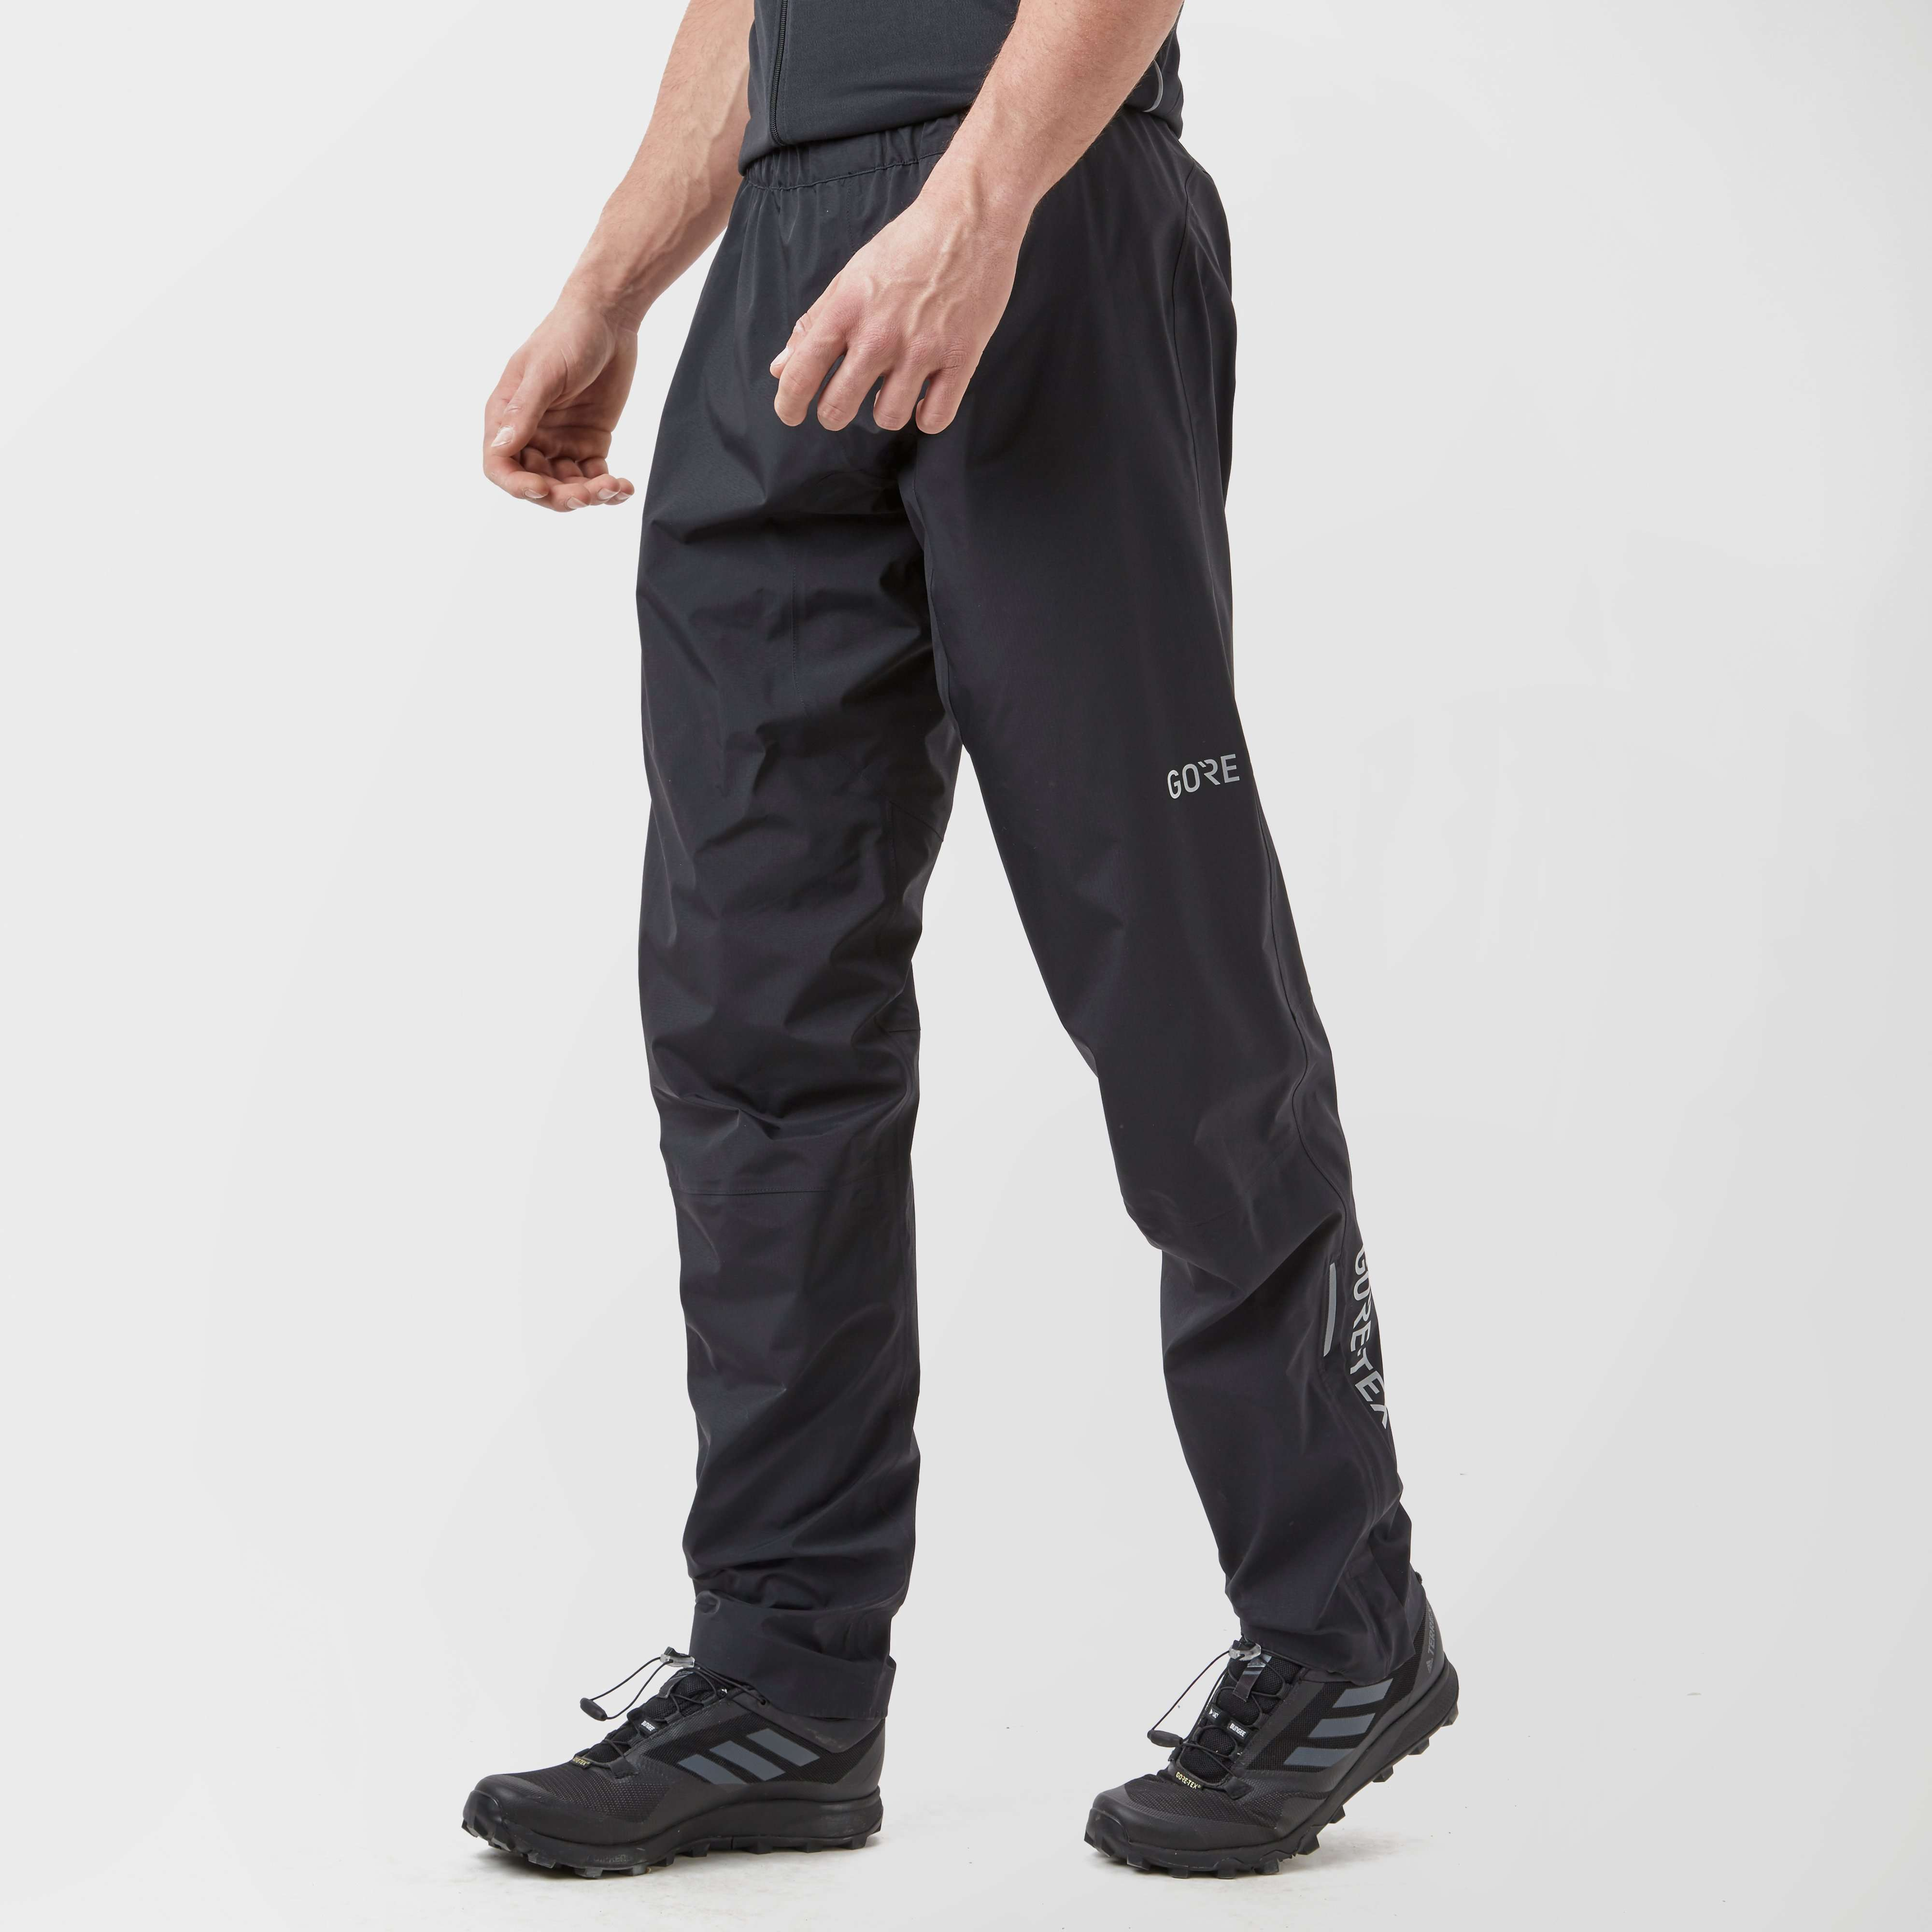 GORE Men's C5 GORE-TEX® Active Pant